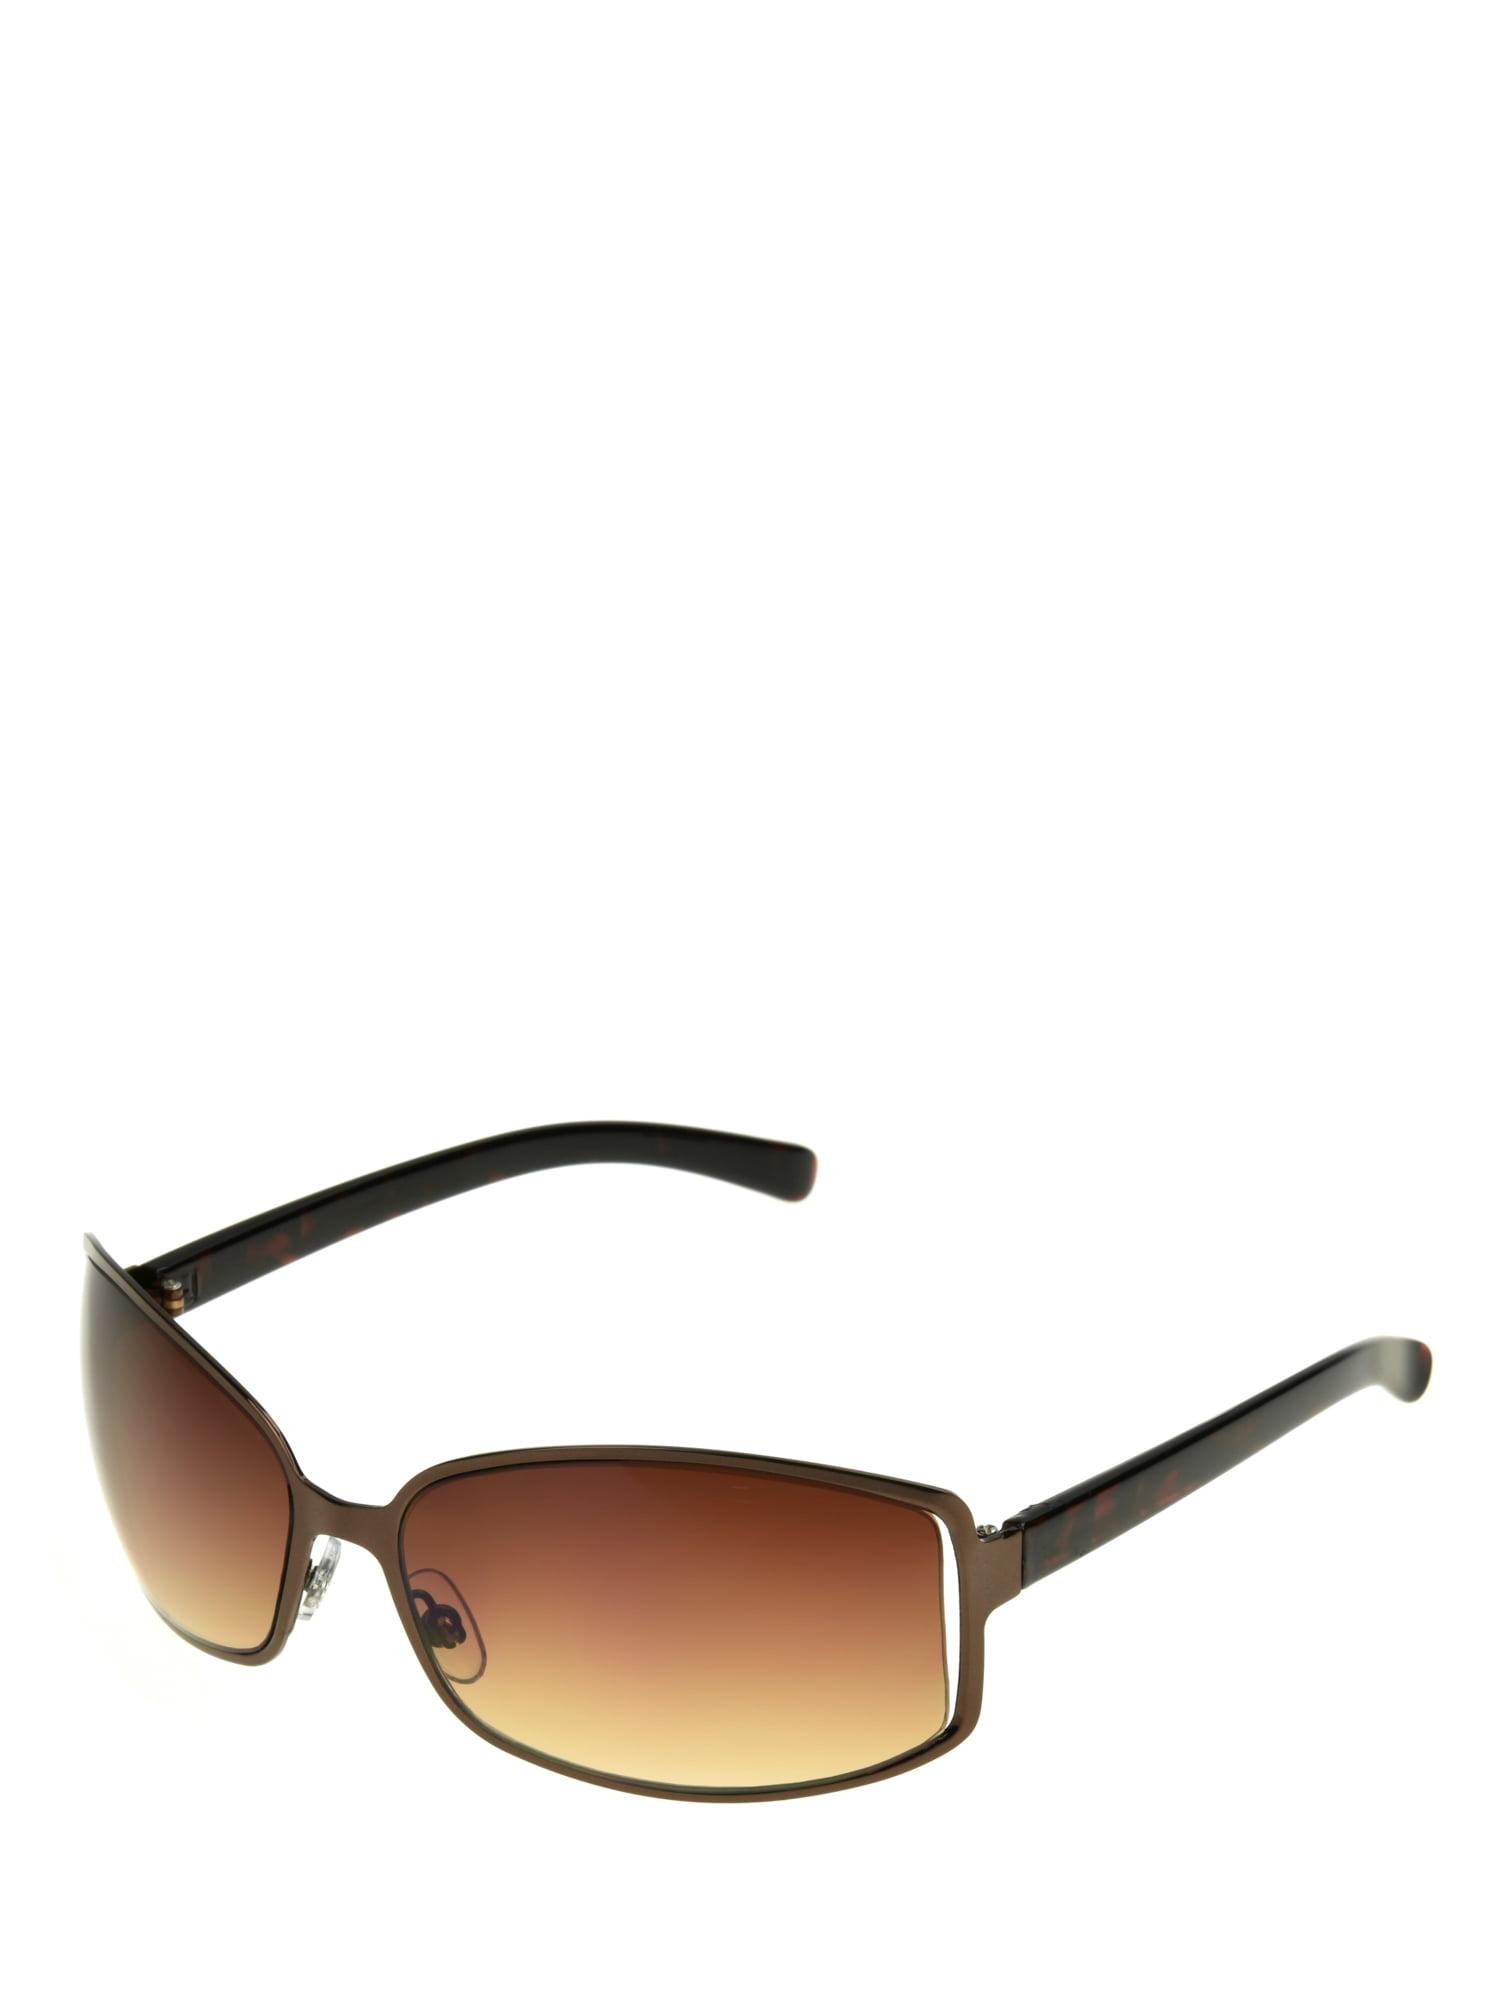 c3c1afa9856b7 Women s Oval 1 Sunglasses – Walmart Inventory Checker – BrickSeek